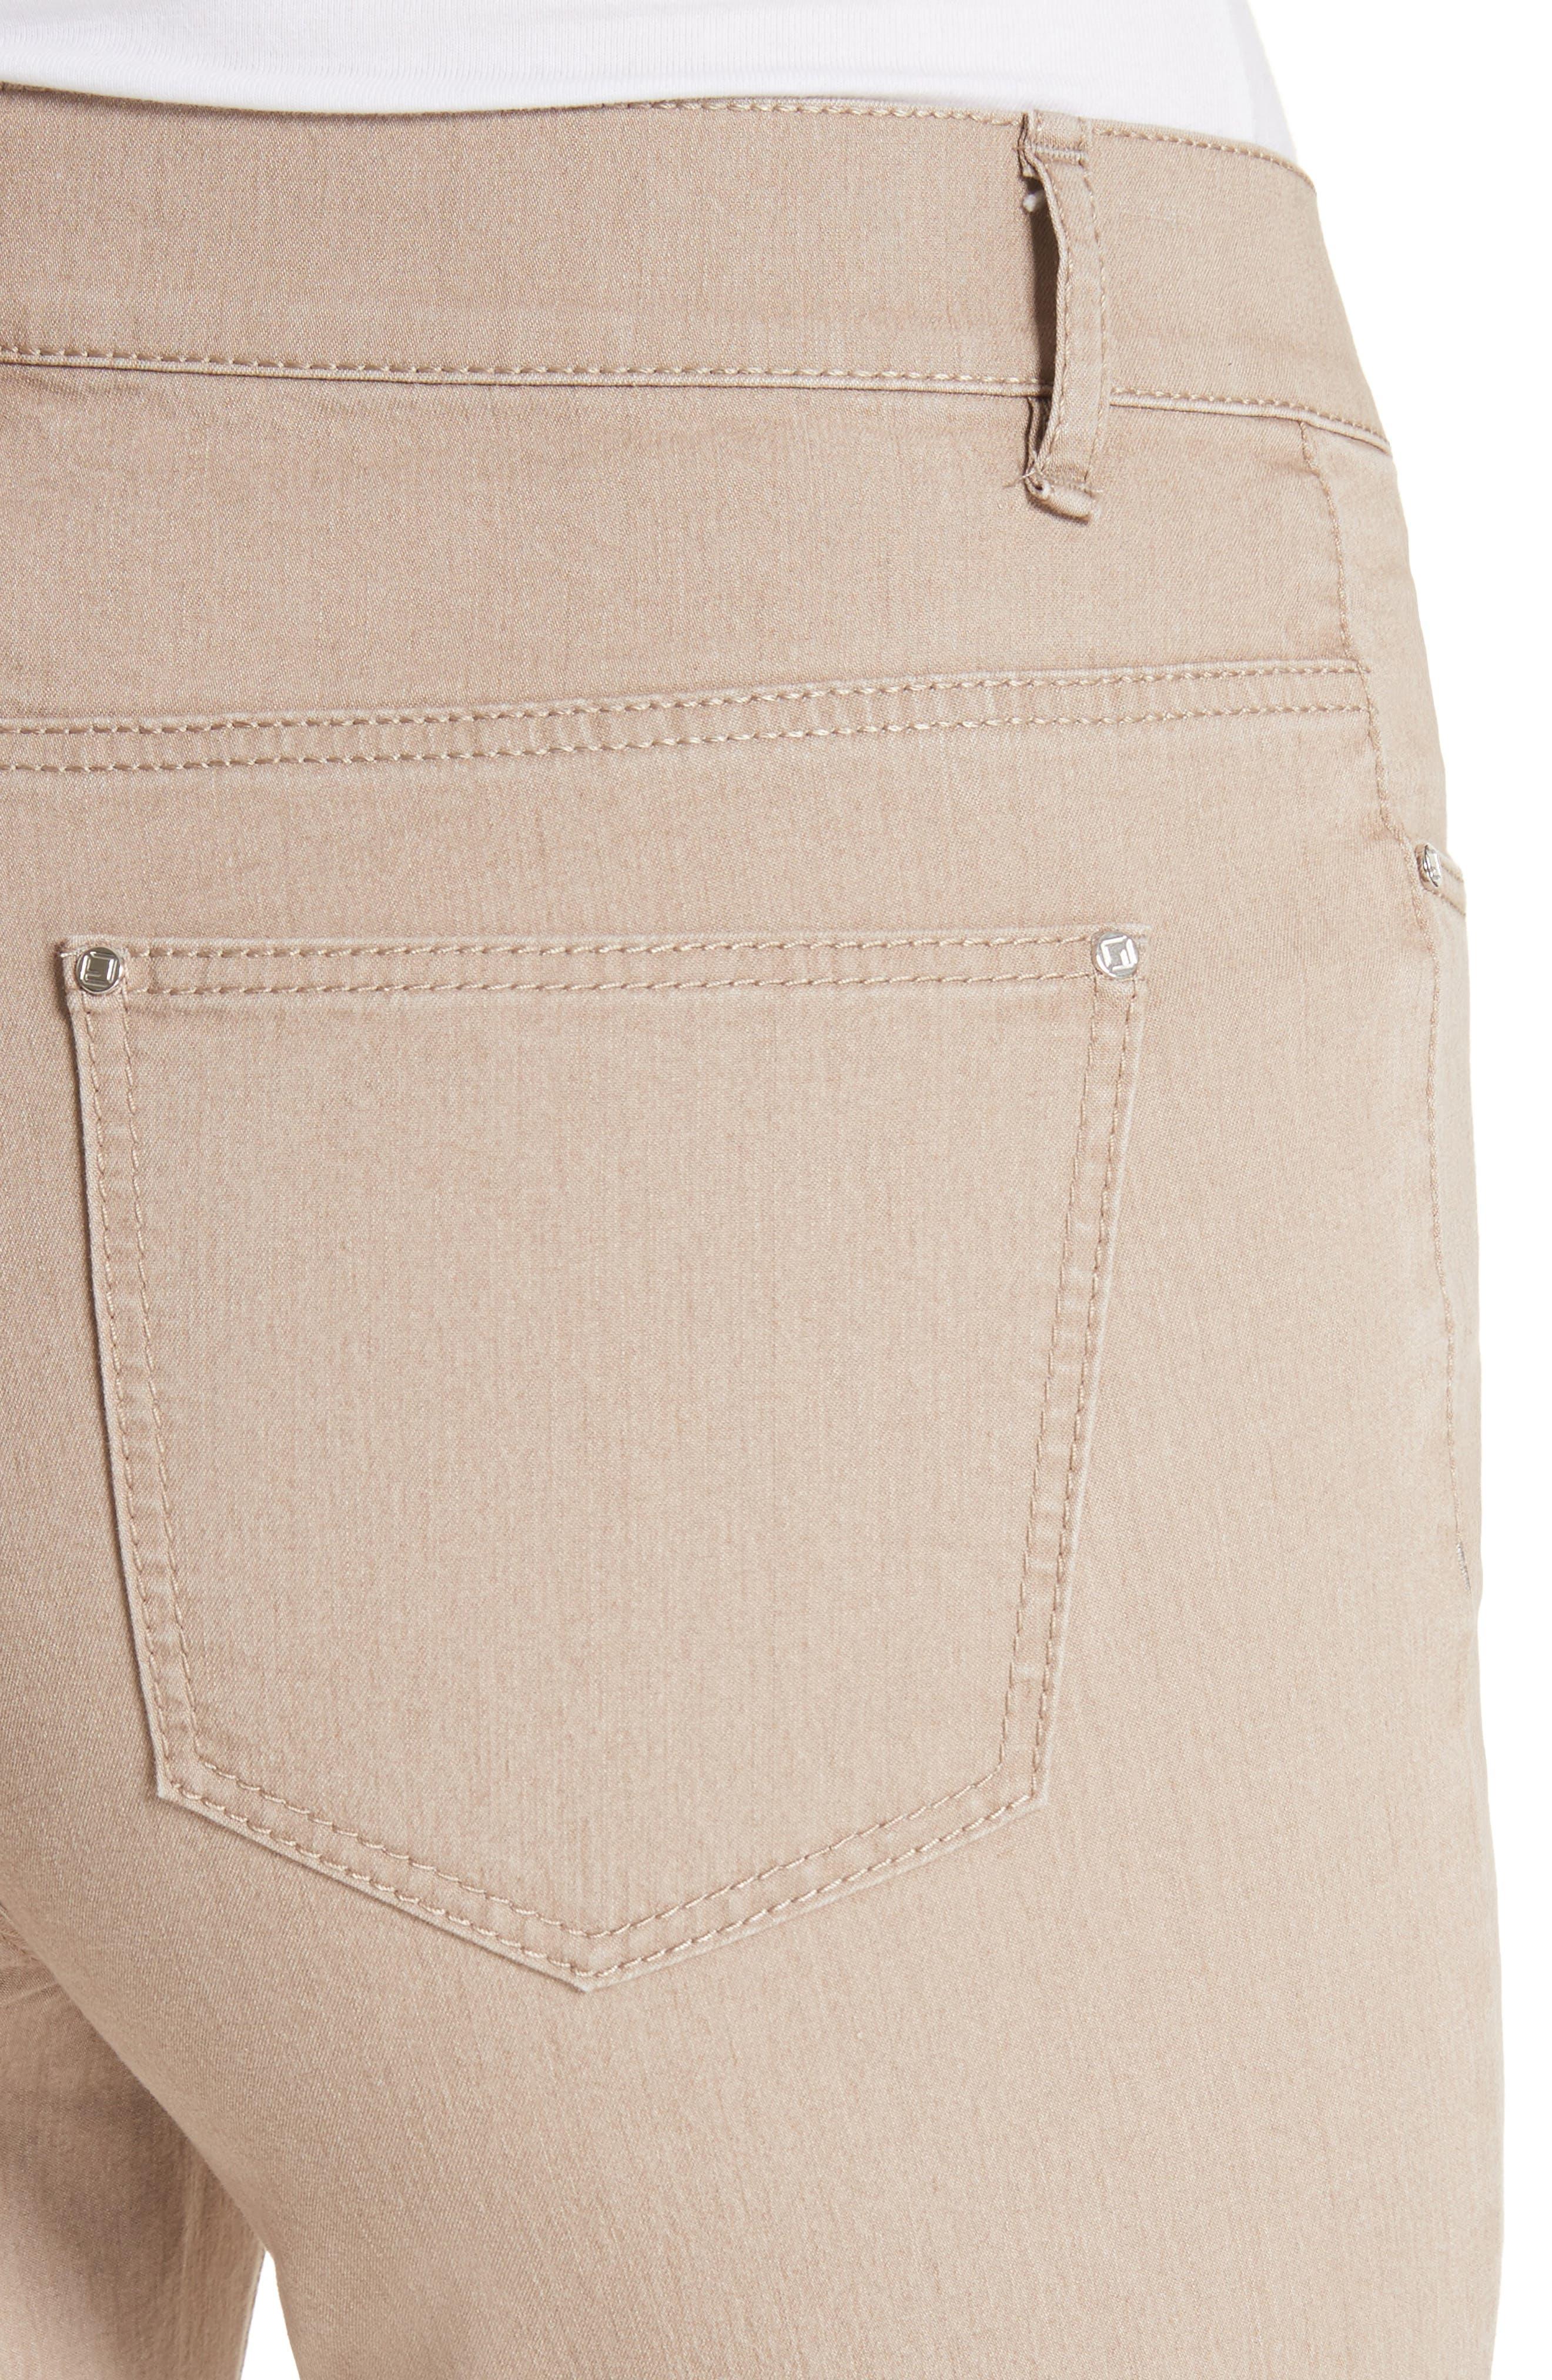 'Primo Denim' Curvy Fit Slim Leg Jeans,                             Alternate thumbnail 4, color,                             Pumice